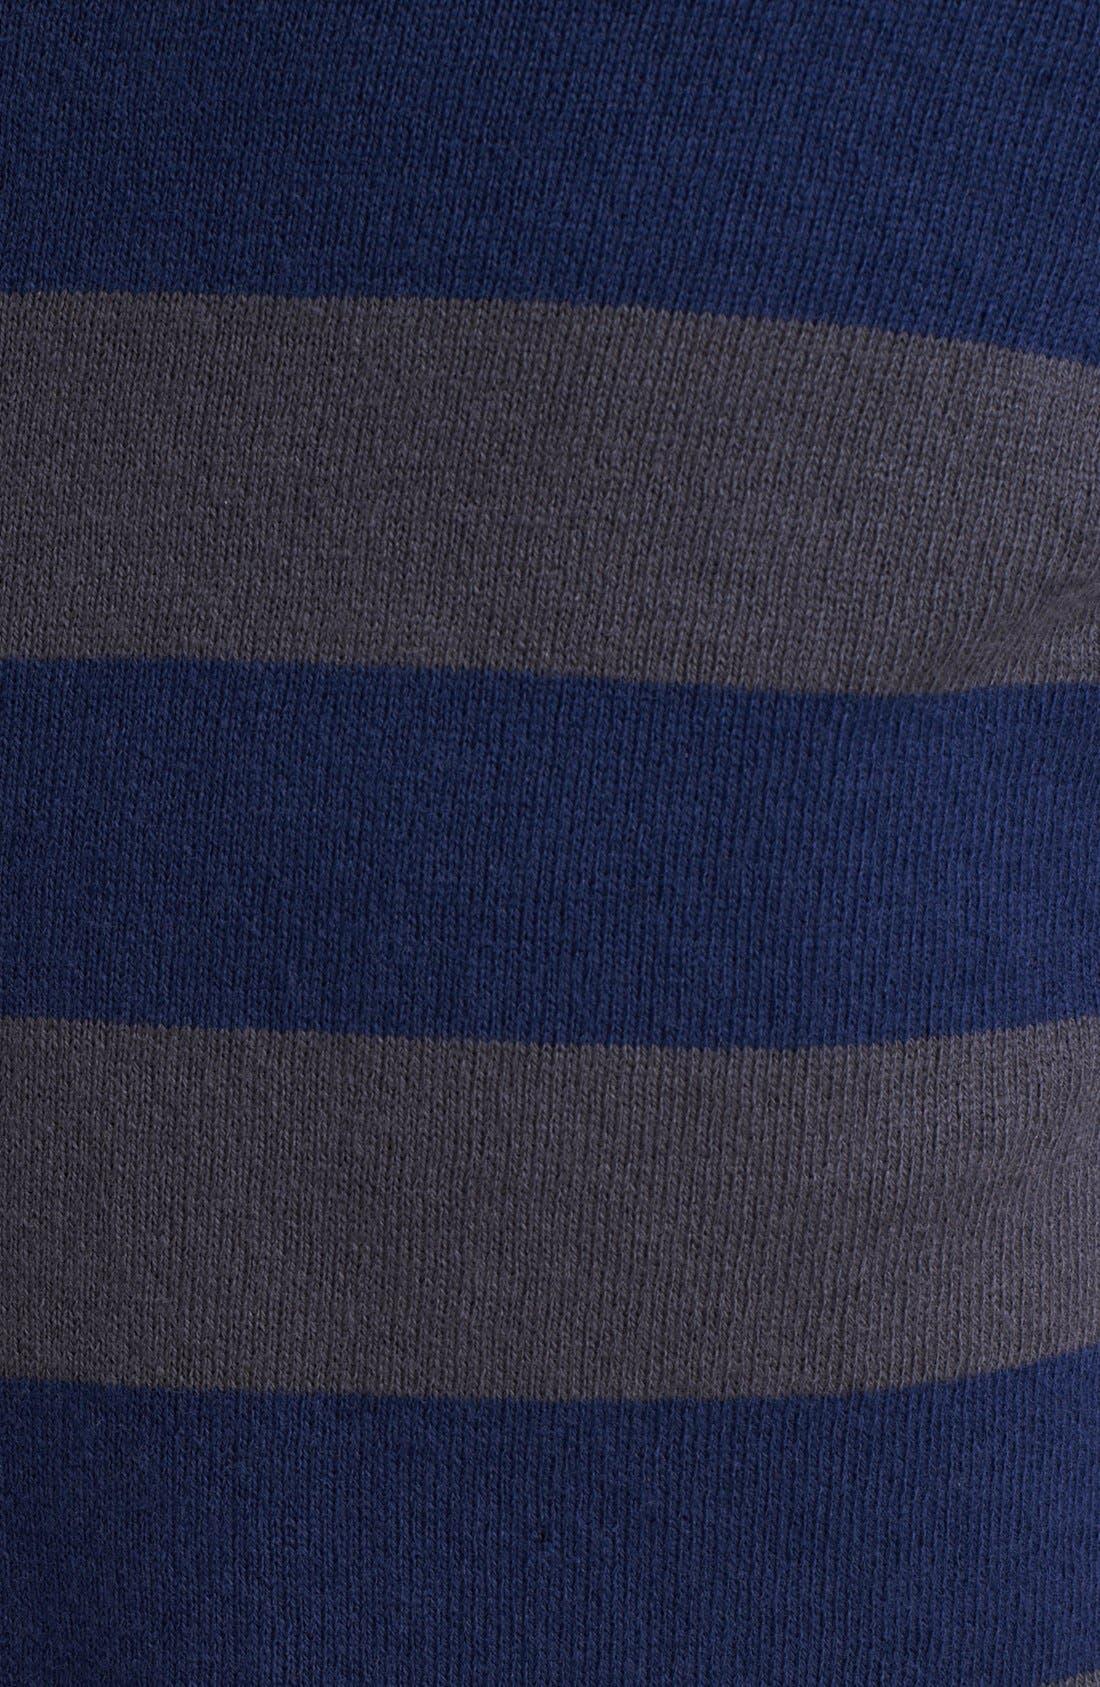 Alternate Image 3  - Junya Watanabe Stripe Jersey Cotton Long Sleeve T-Shirt